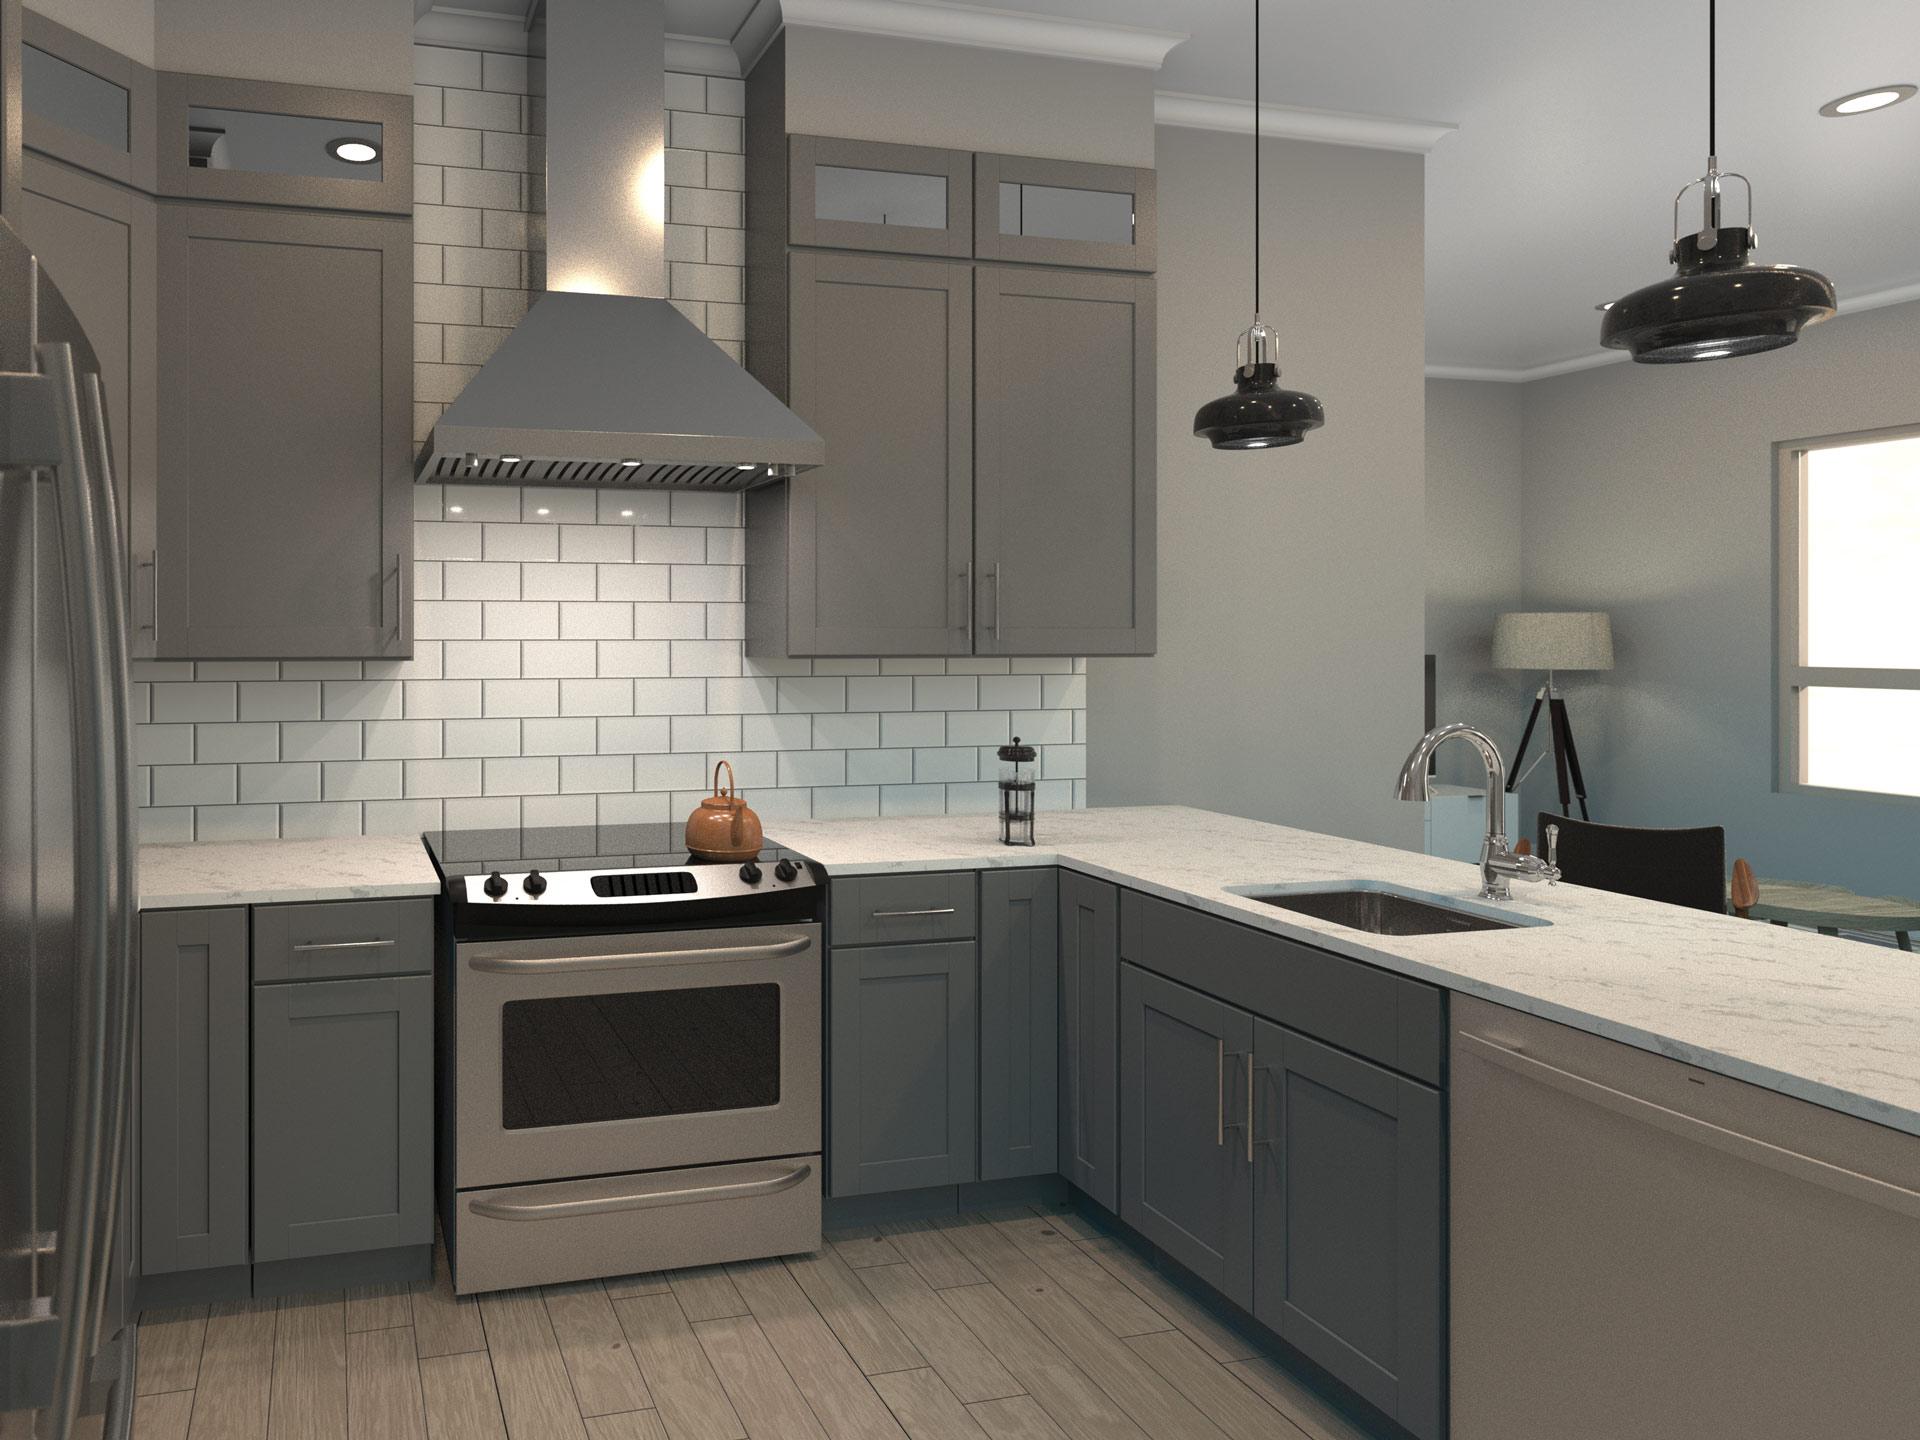 New construction apartment building design kitchen